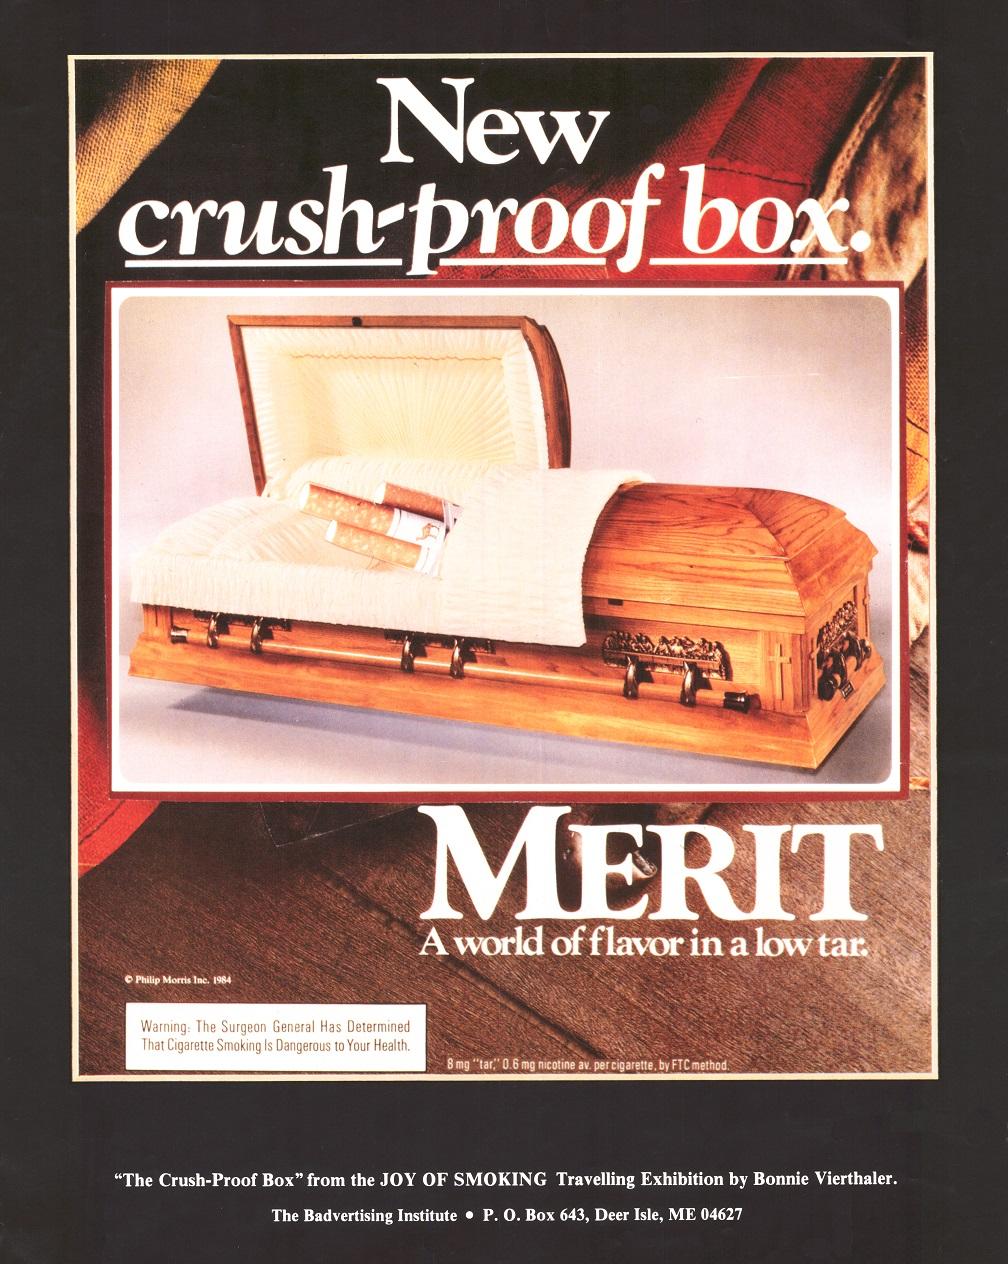 New Crush Proof Box The Badvertising Institute